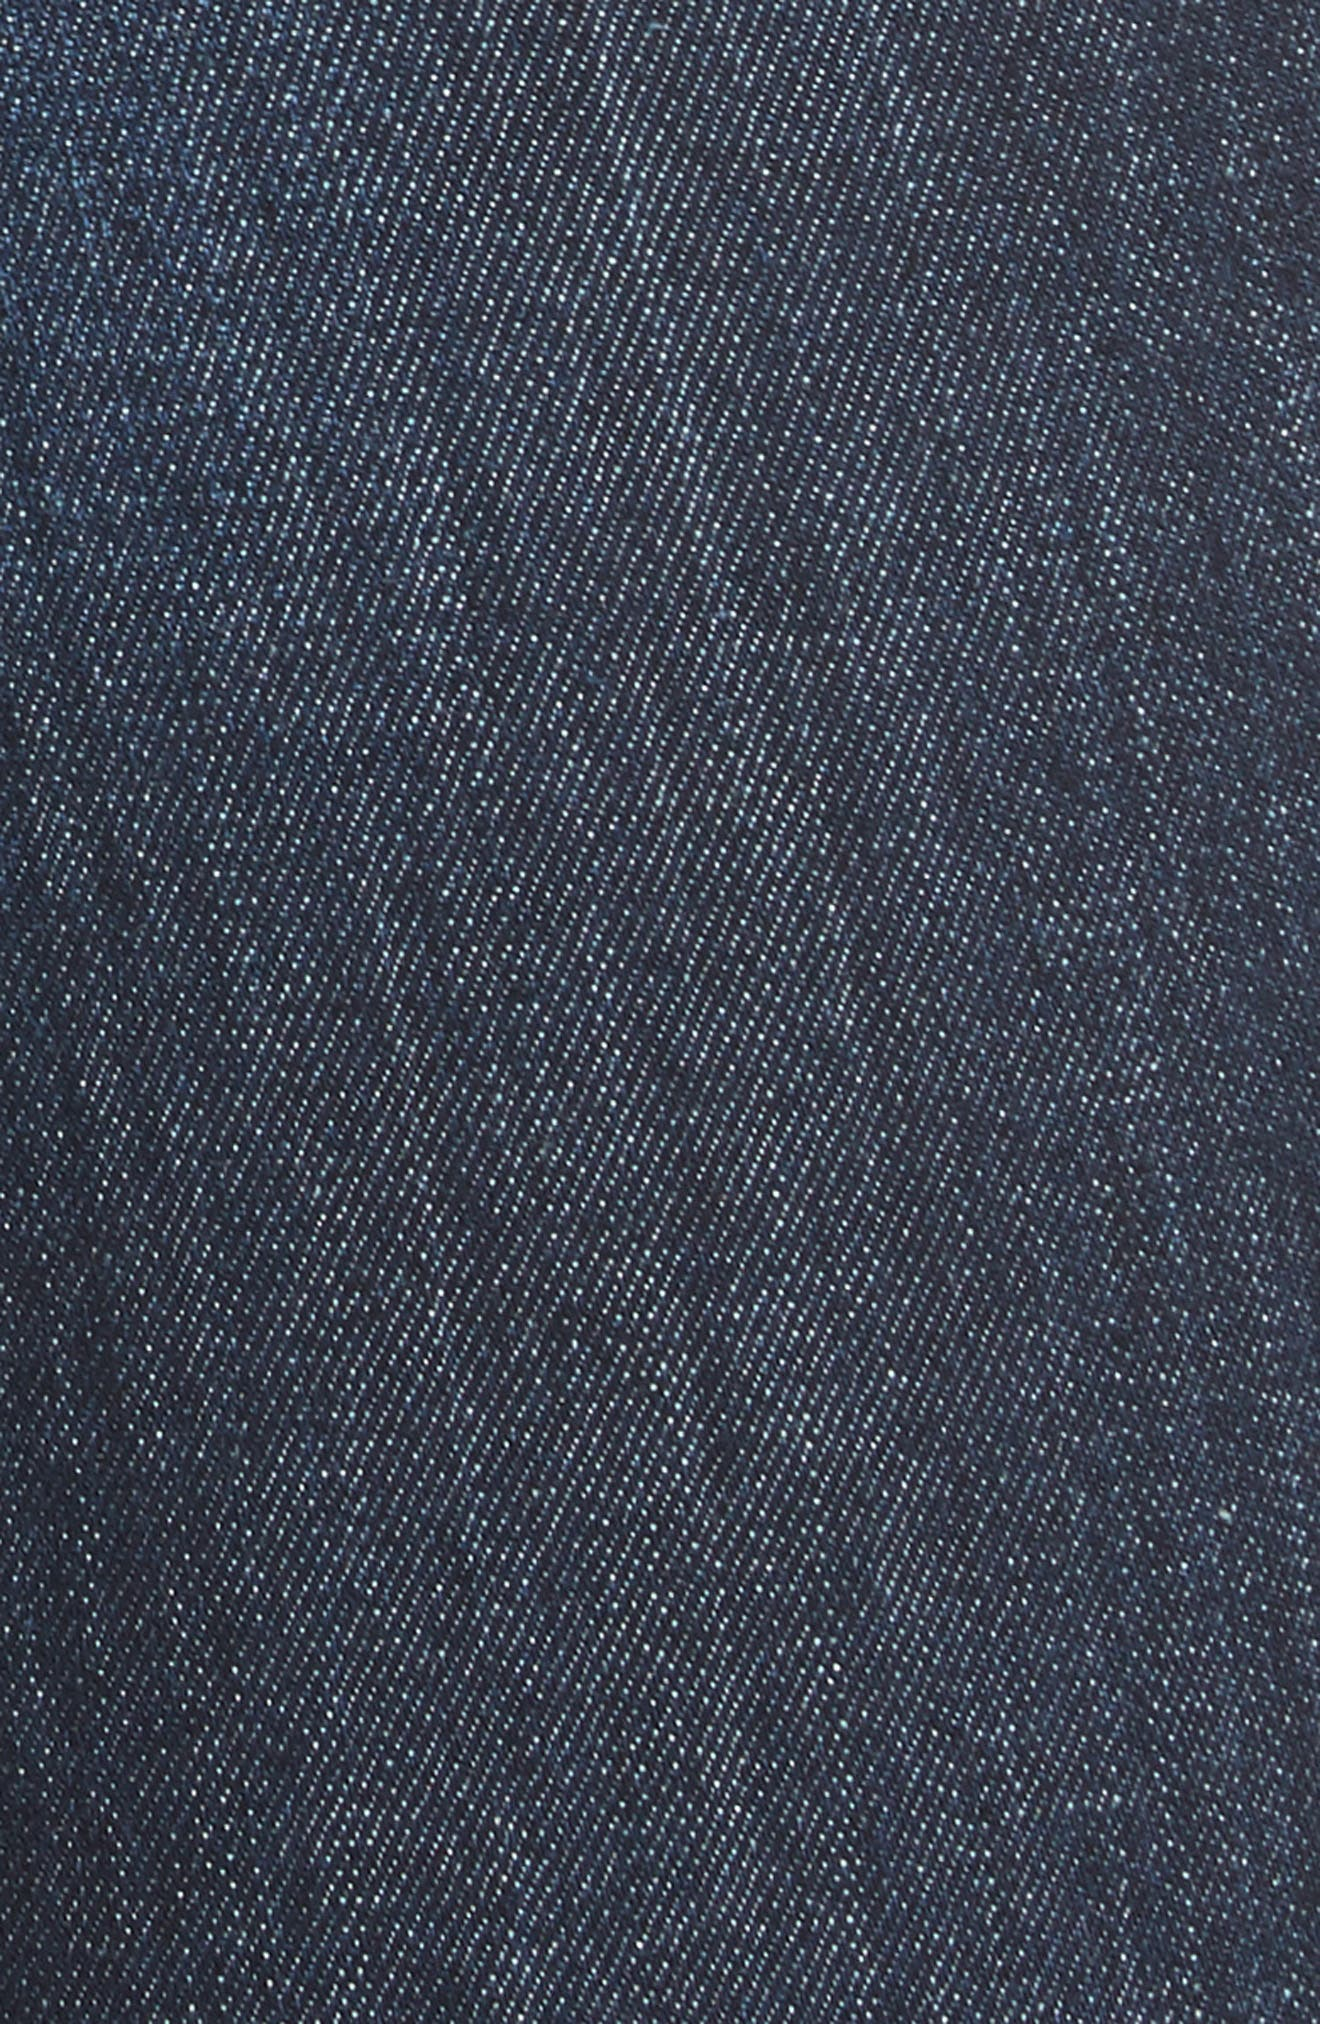 AO.LA Good High Waist Pintuck Skinny Jeans,                             Alternate thumbnail 5, color,                             Dream On